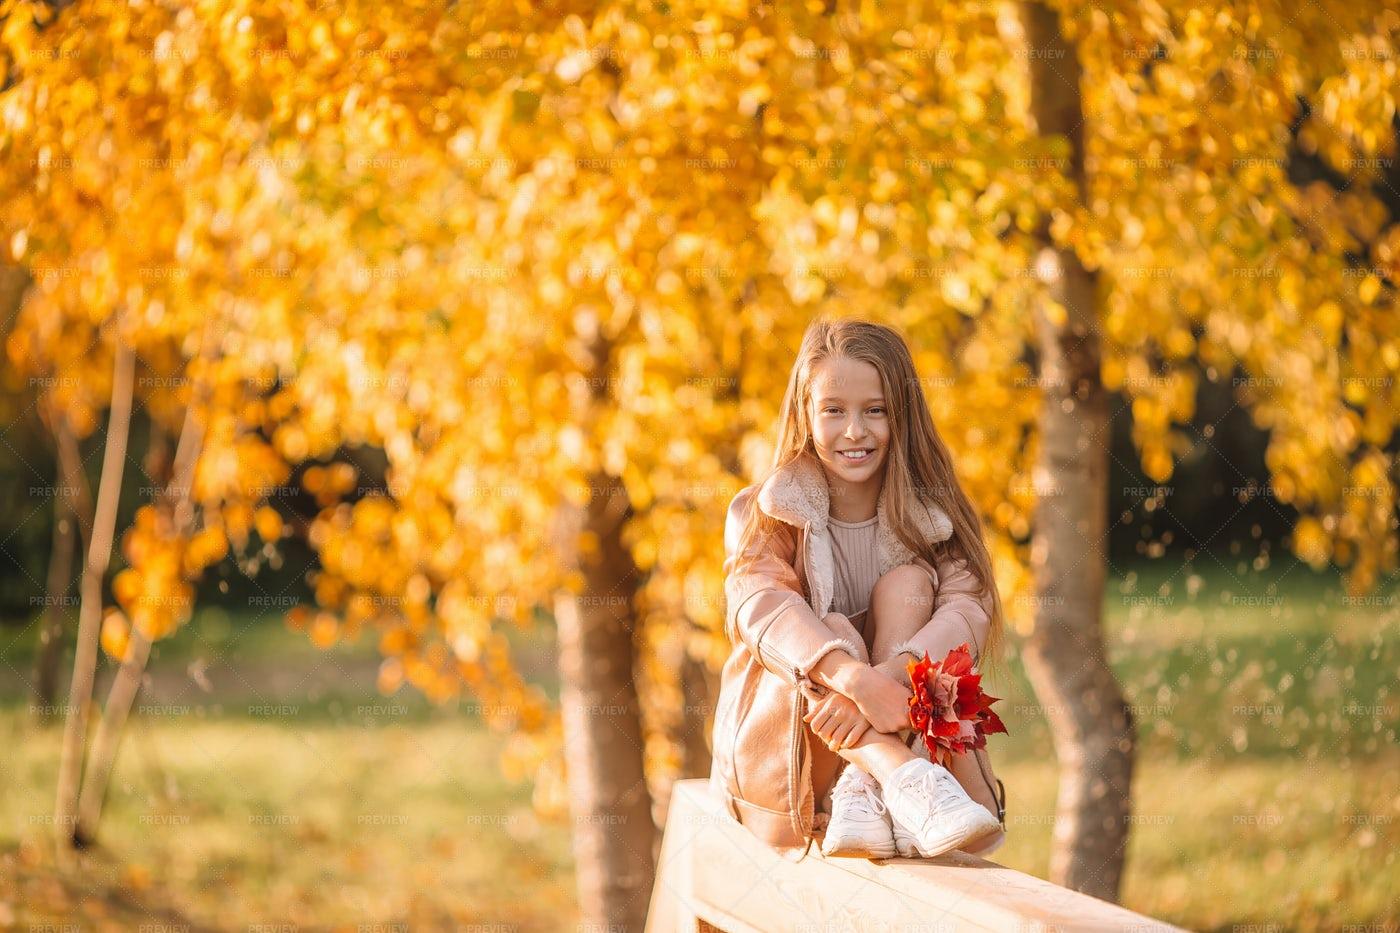 Girl Sitting On Wooden Railing: Stock Photos